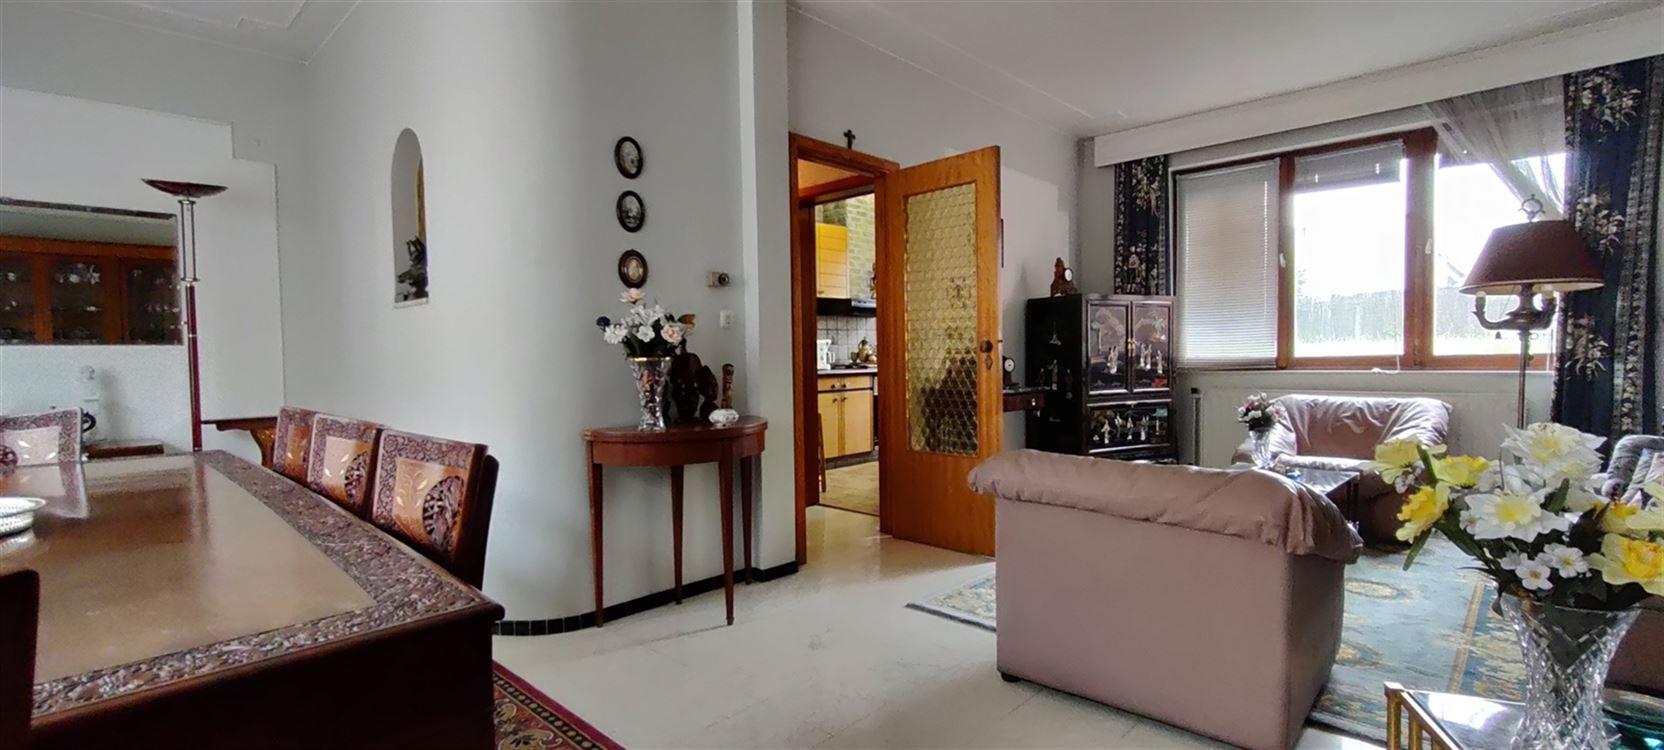 Foto 4 : Huis te 1420 BRAINE-L'ALLEUD (België) - Prijs € 335.000